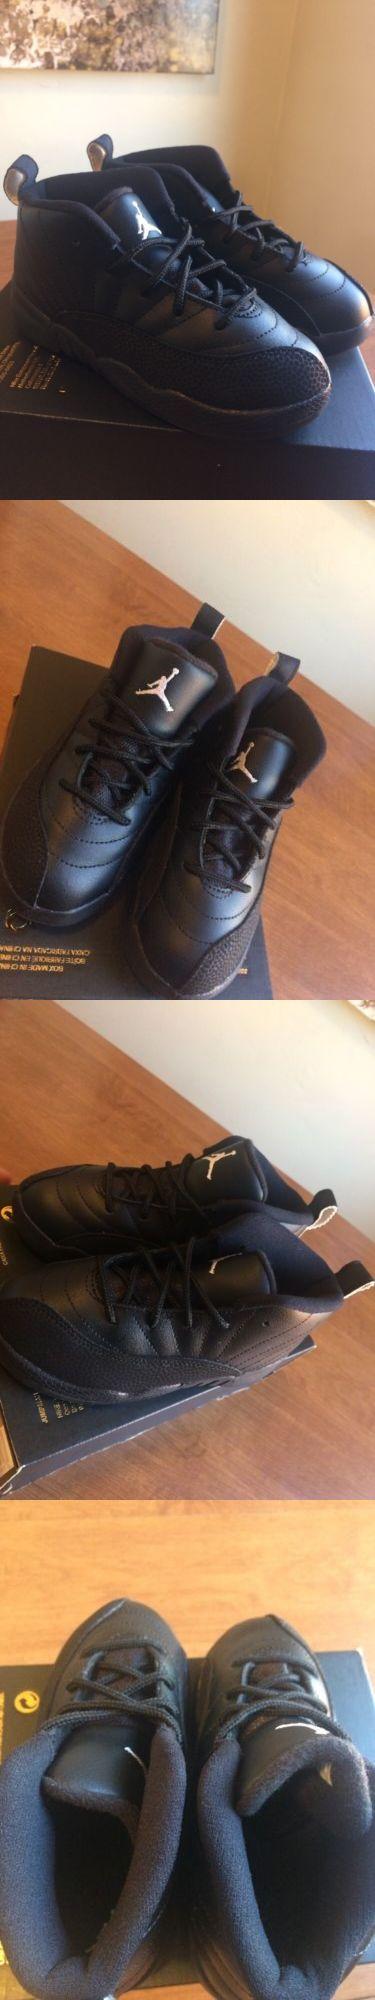 Baby Shoes 147285: Air Jordan Retro 12 Bt Master Black White-Black- Gold Size 9C 10C (850000-013) -> BUY IT NOW ONLY: $79.99 on eBay!